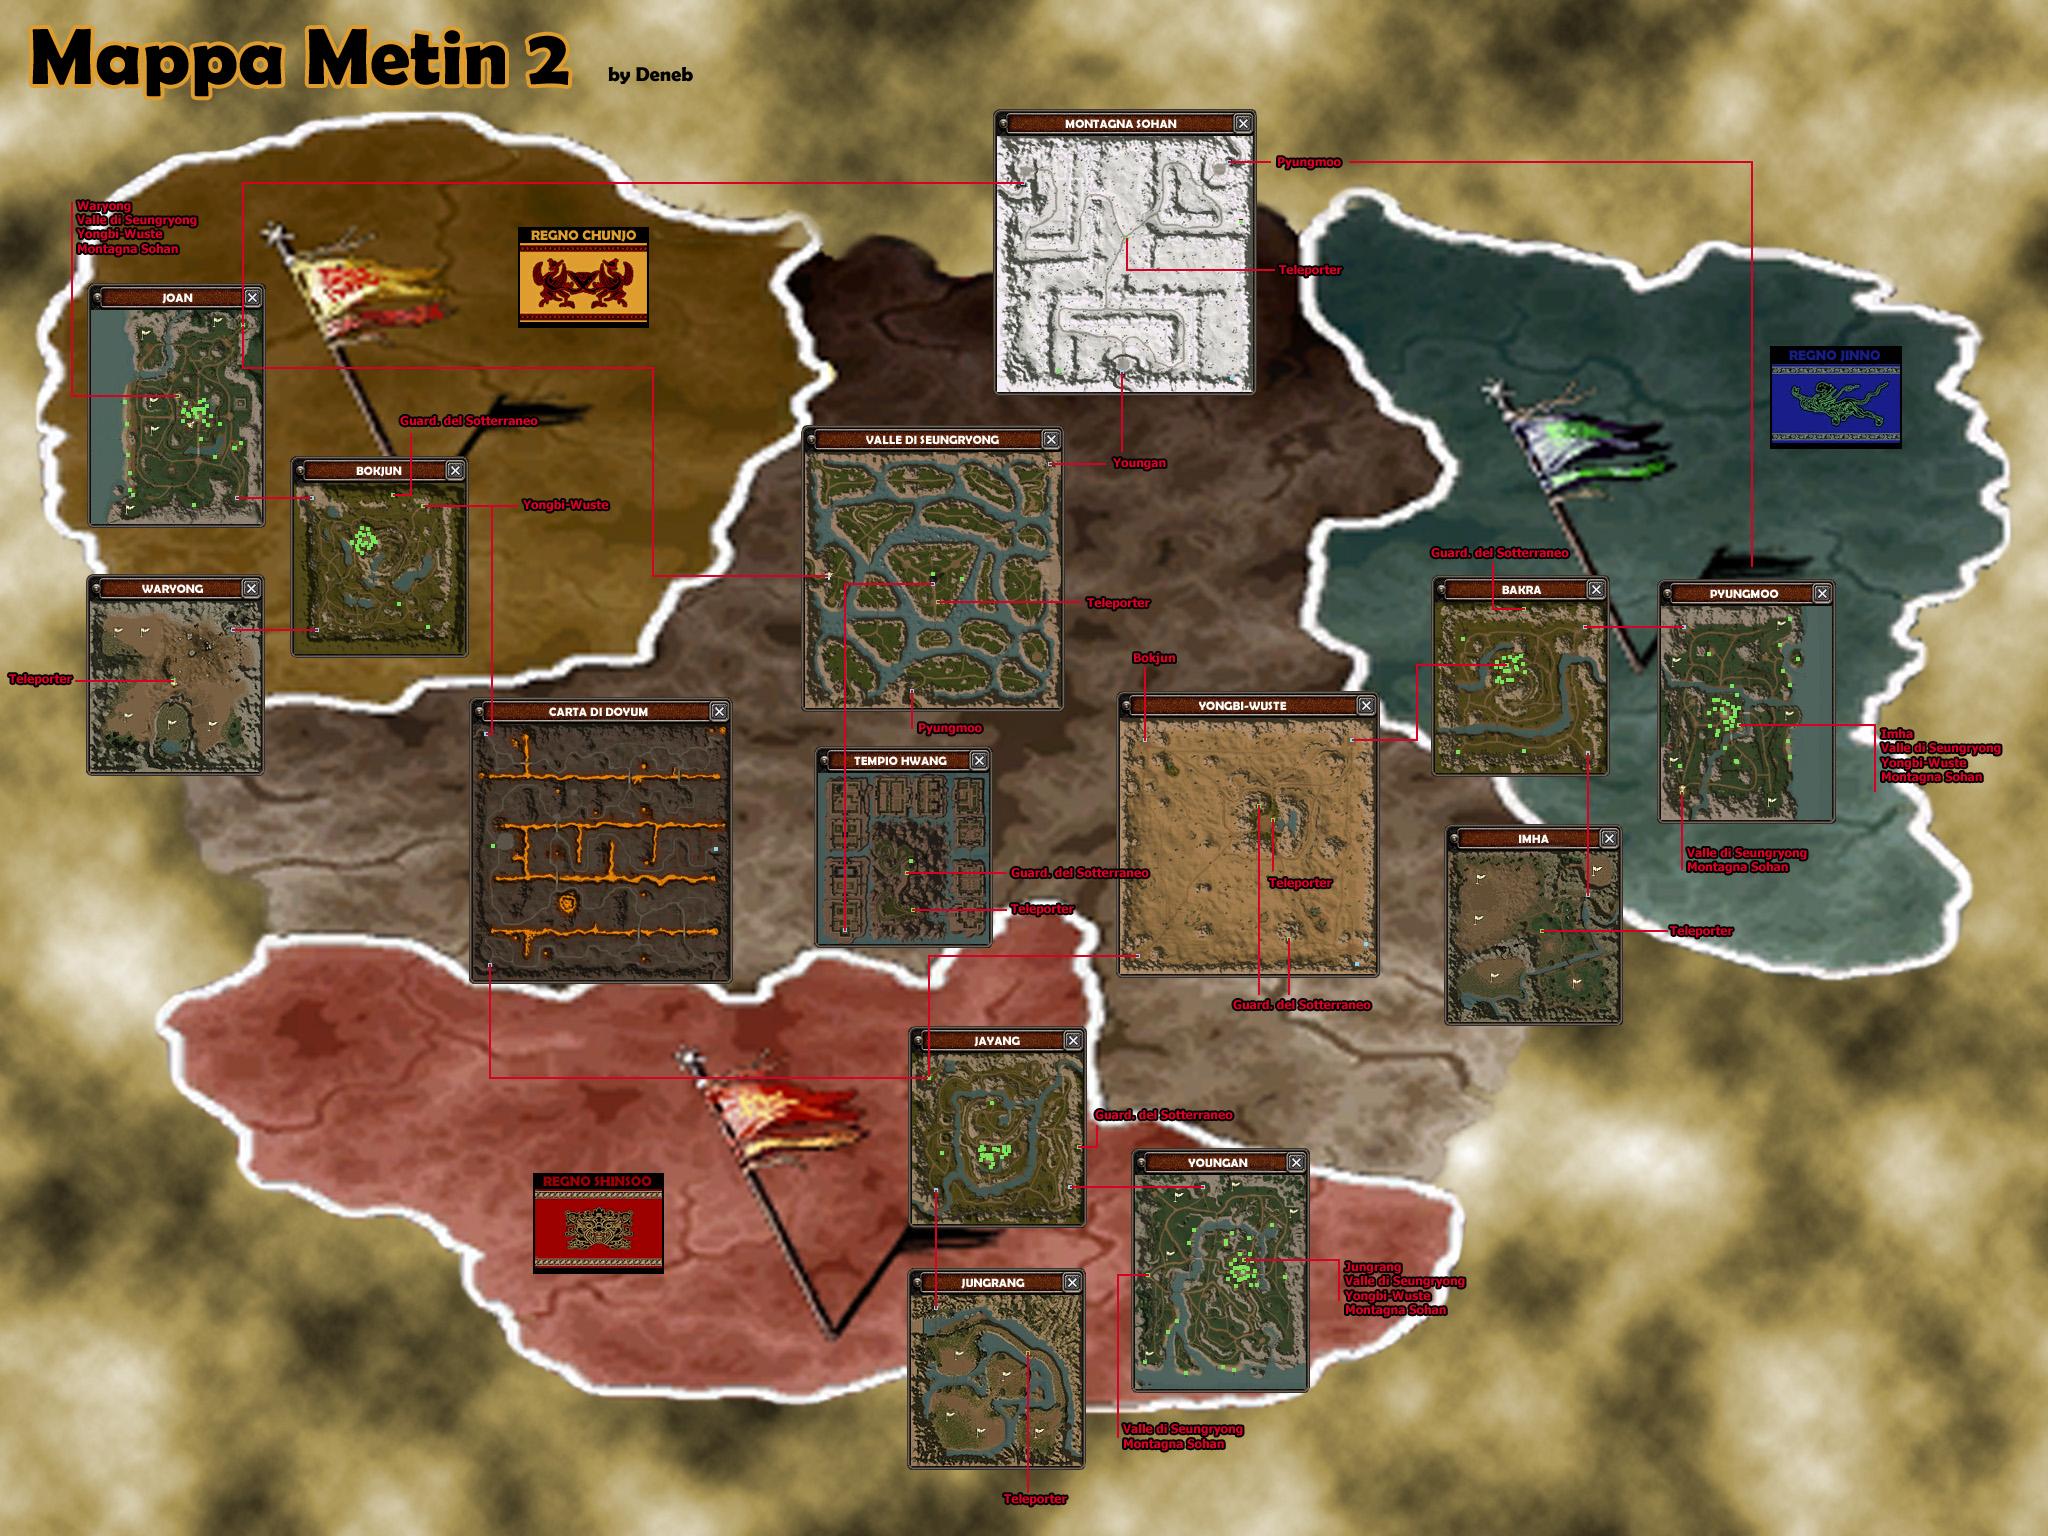 Metin2 u.u el mejor juego MappaMetin2DENEB